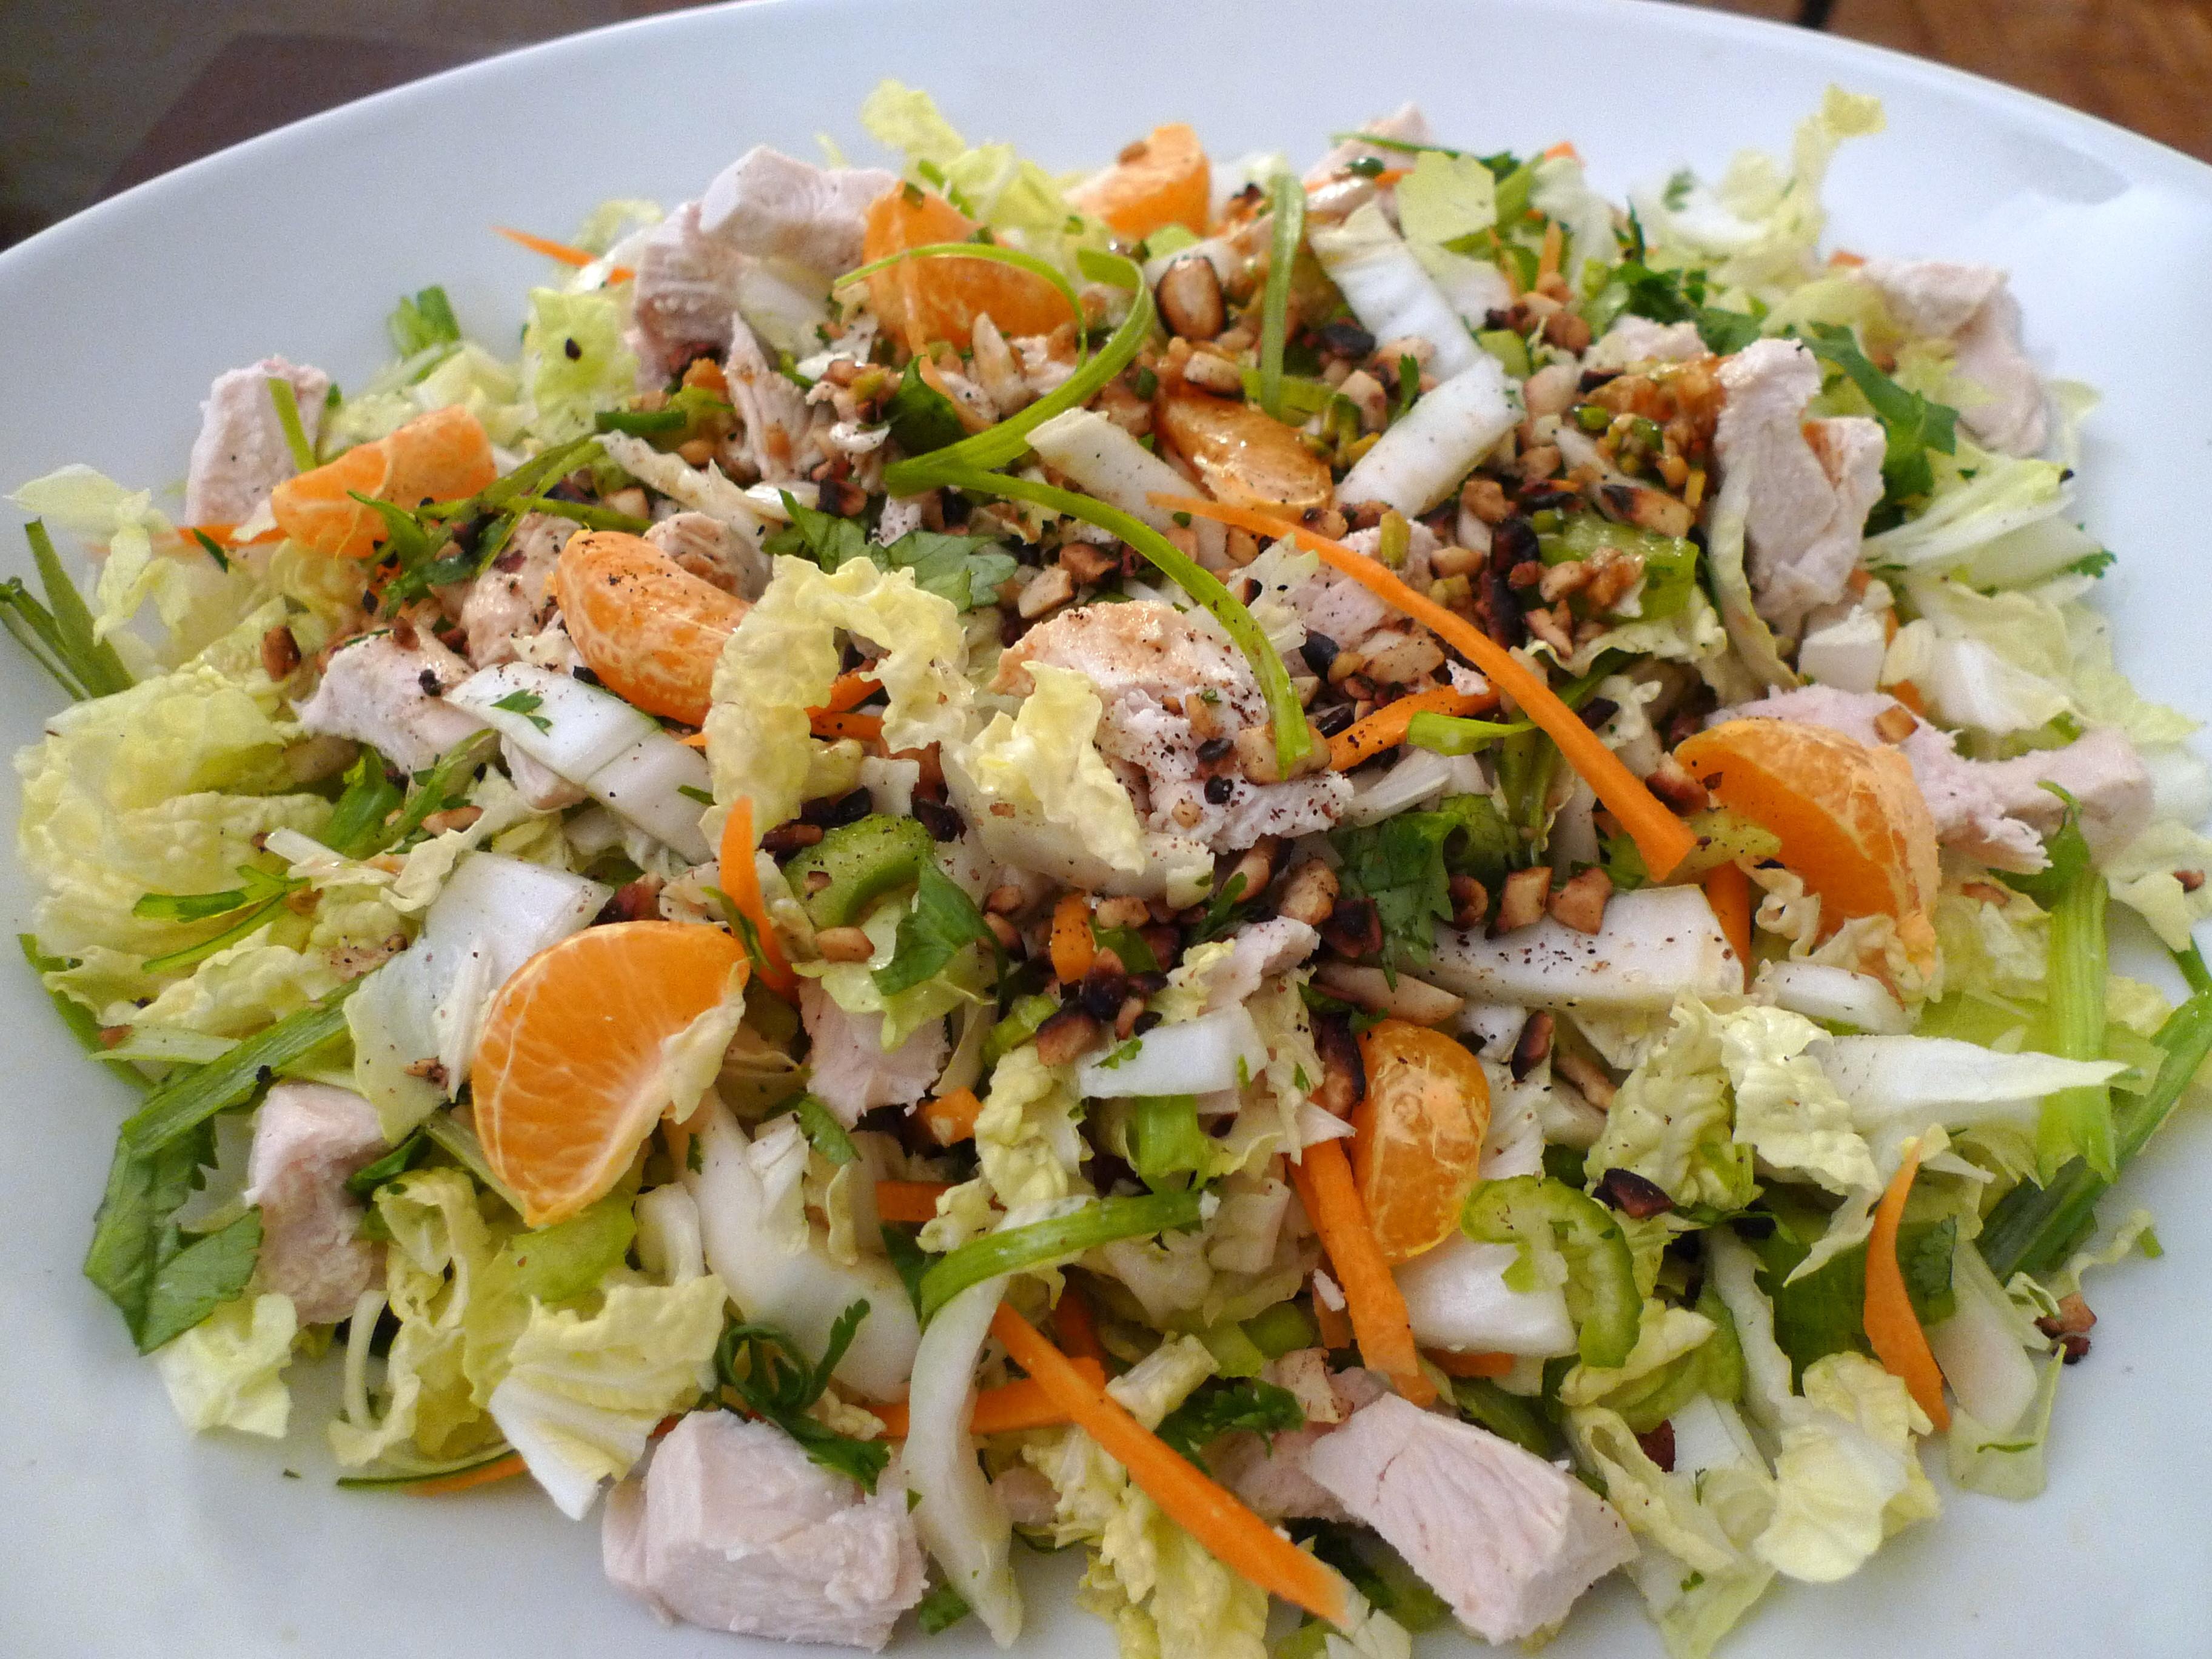 Chinese Salads Recipes  Chinese Chicken Salad Recipe — Dishmaps